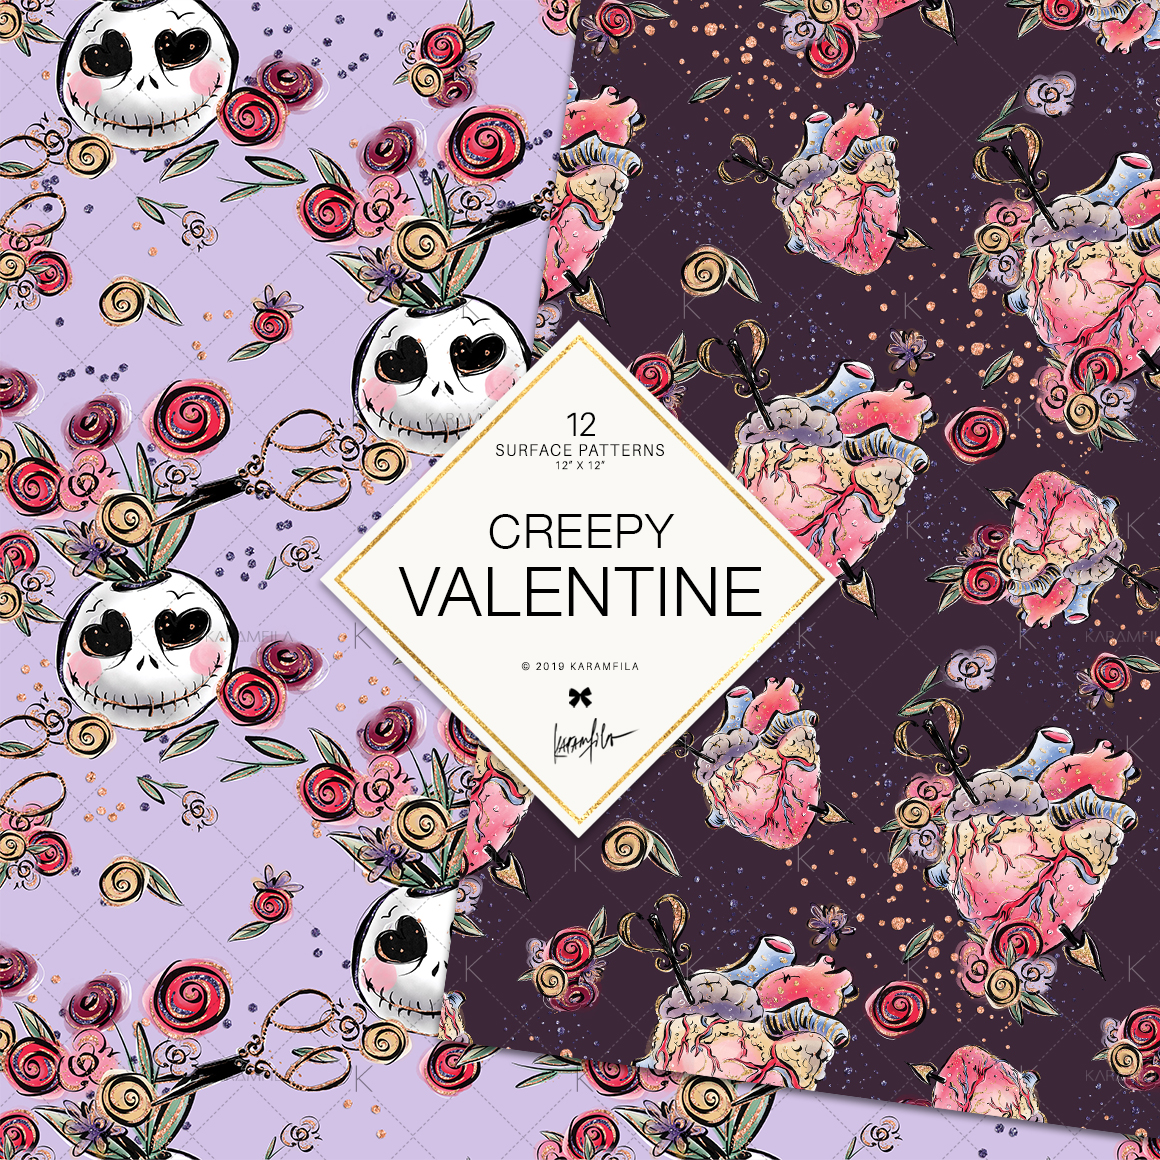 Creepy Valentine's Day Patterns example image 5